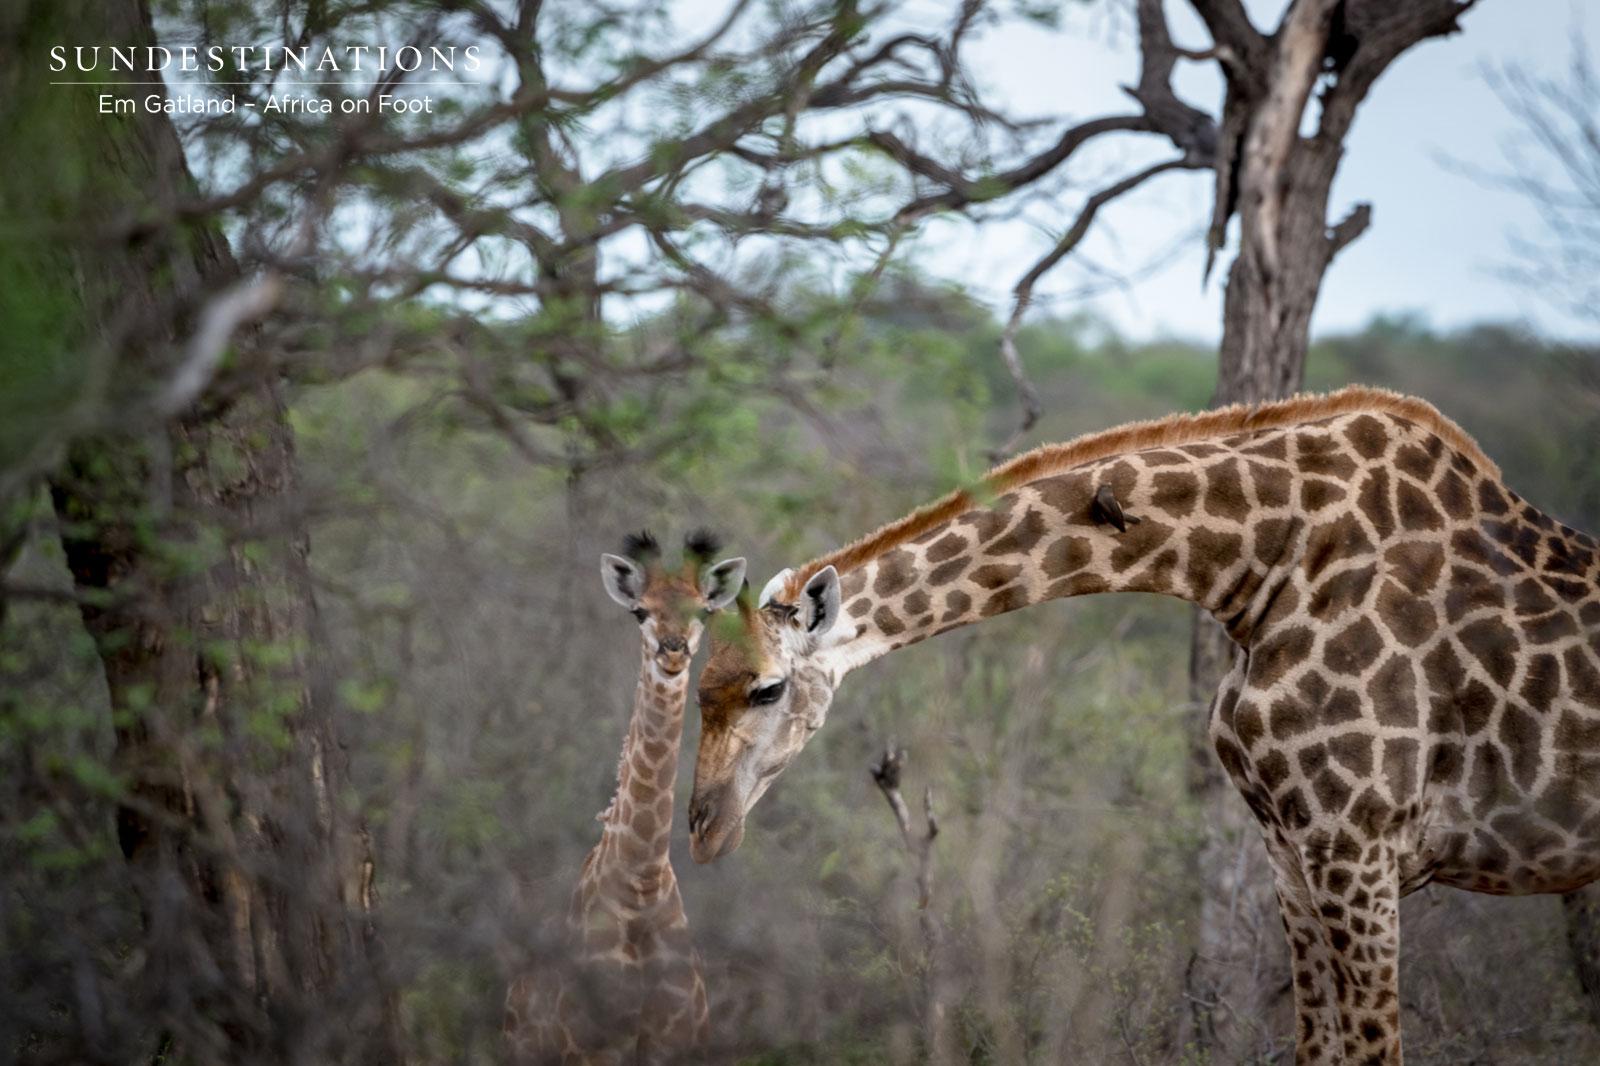 Giraffe Calf and Adult